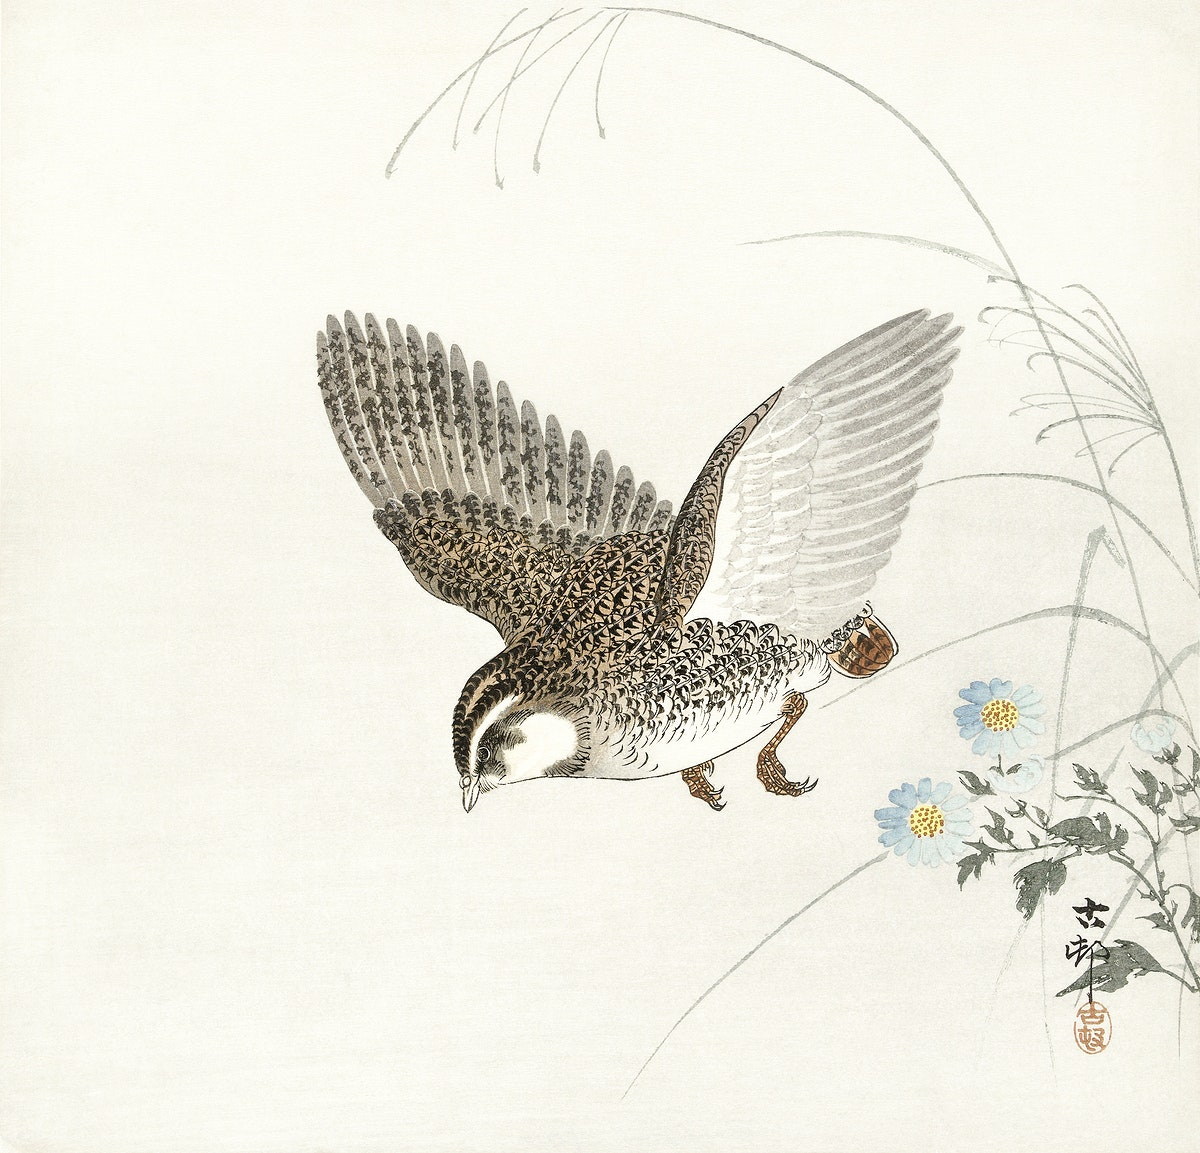 Flying quail (1900 - 1930) by Ohara Koson (1877-1945). Original from The Rijksmuseum. Digitally enhanced by rawpixel.